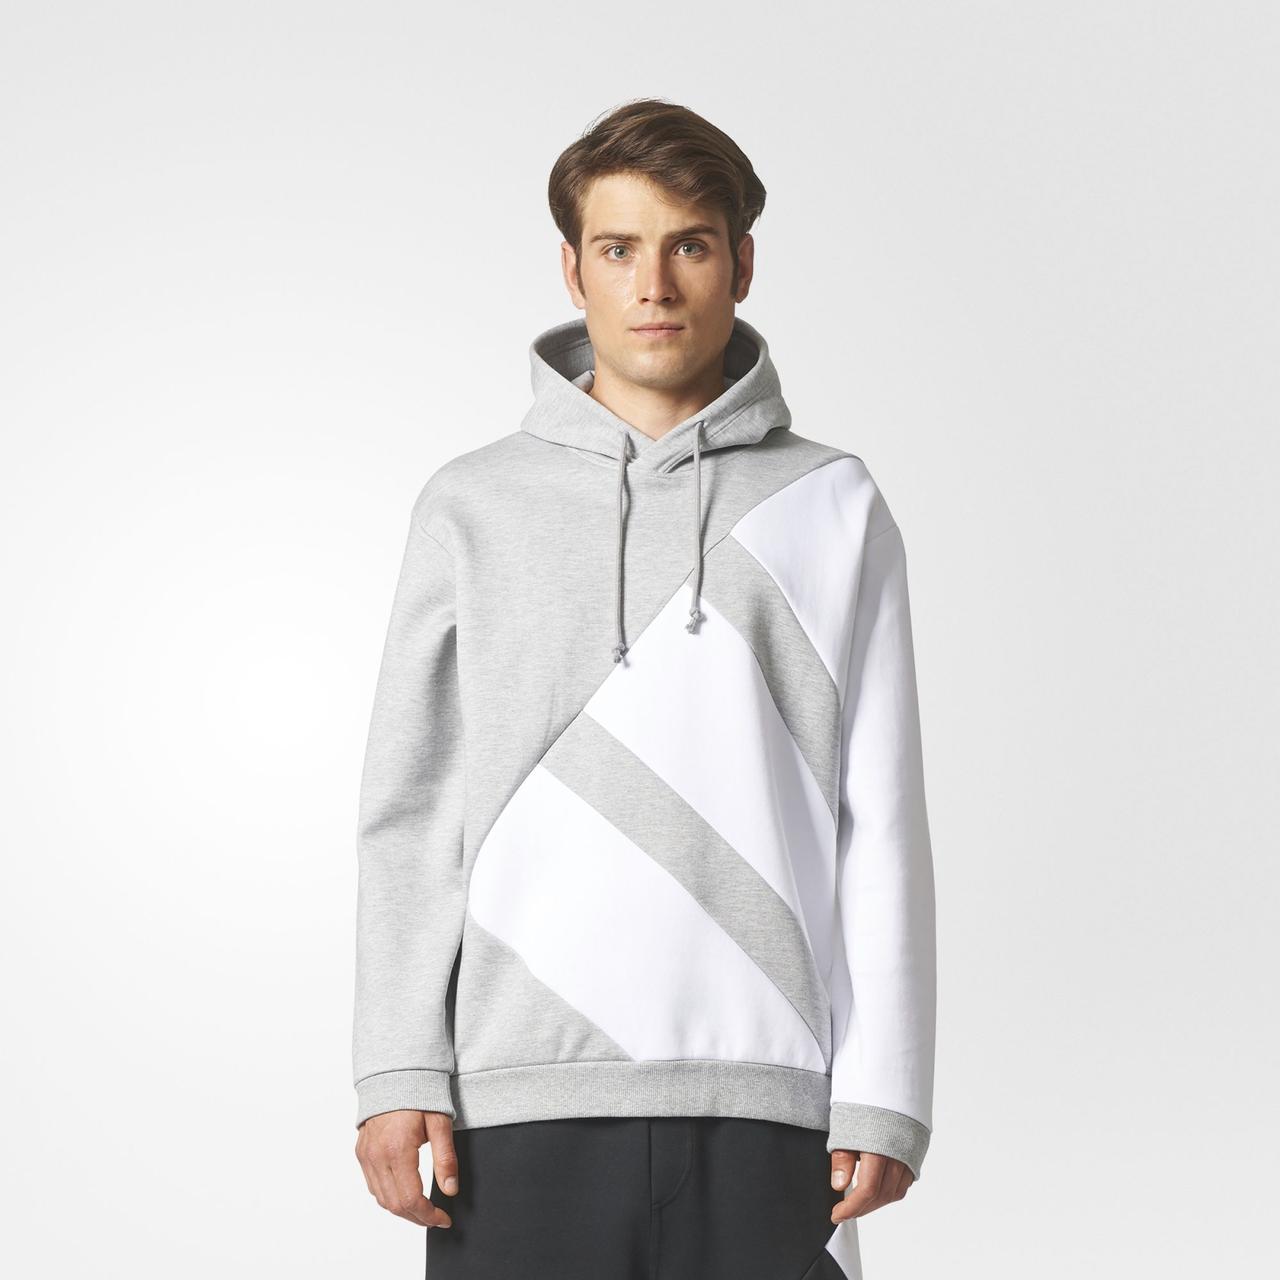 Худи Adidas EQT PDX - Popsport.com.ua ‒ интернет-магазин спортивной одежды e9f4329e714